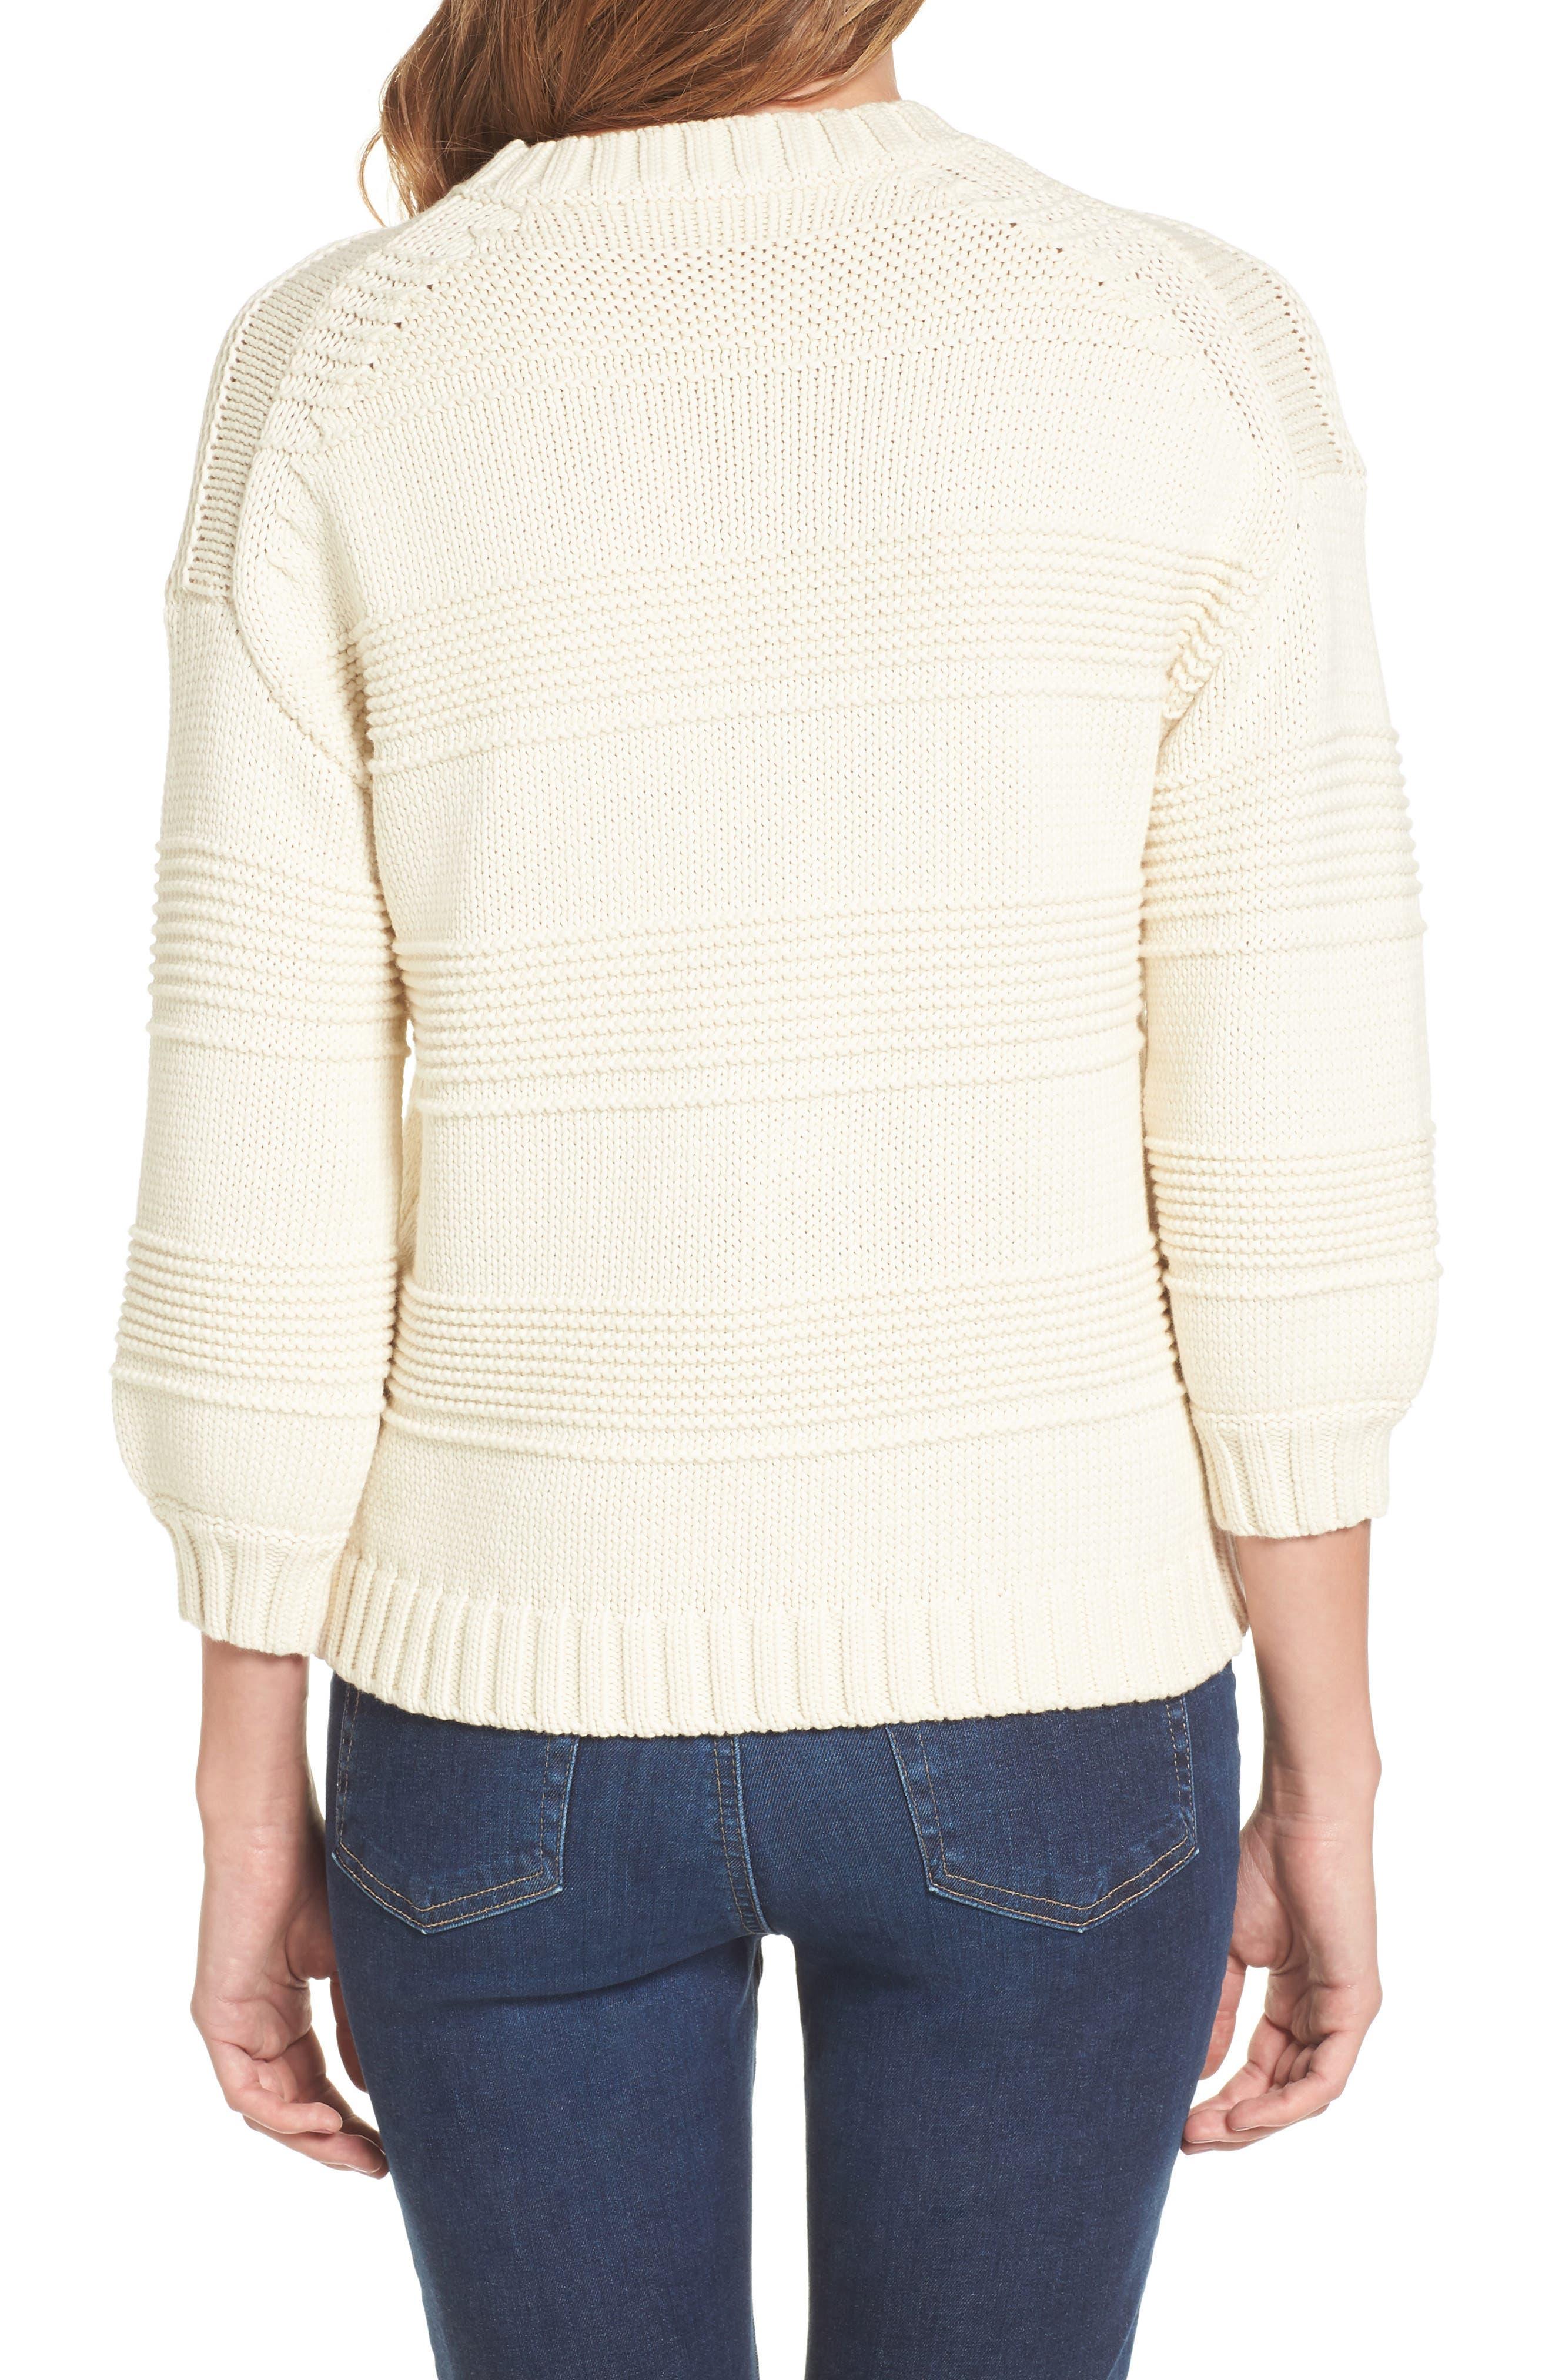 Sabrina Crewneck Sweater,                             Alternate thumbnail 2, color,                             BRIGHT CREAM